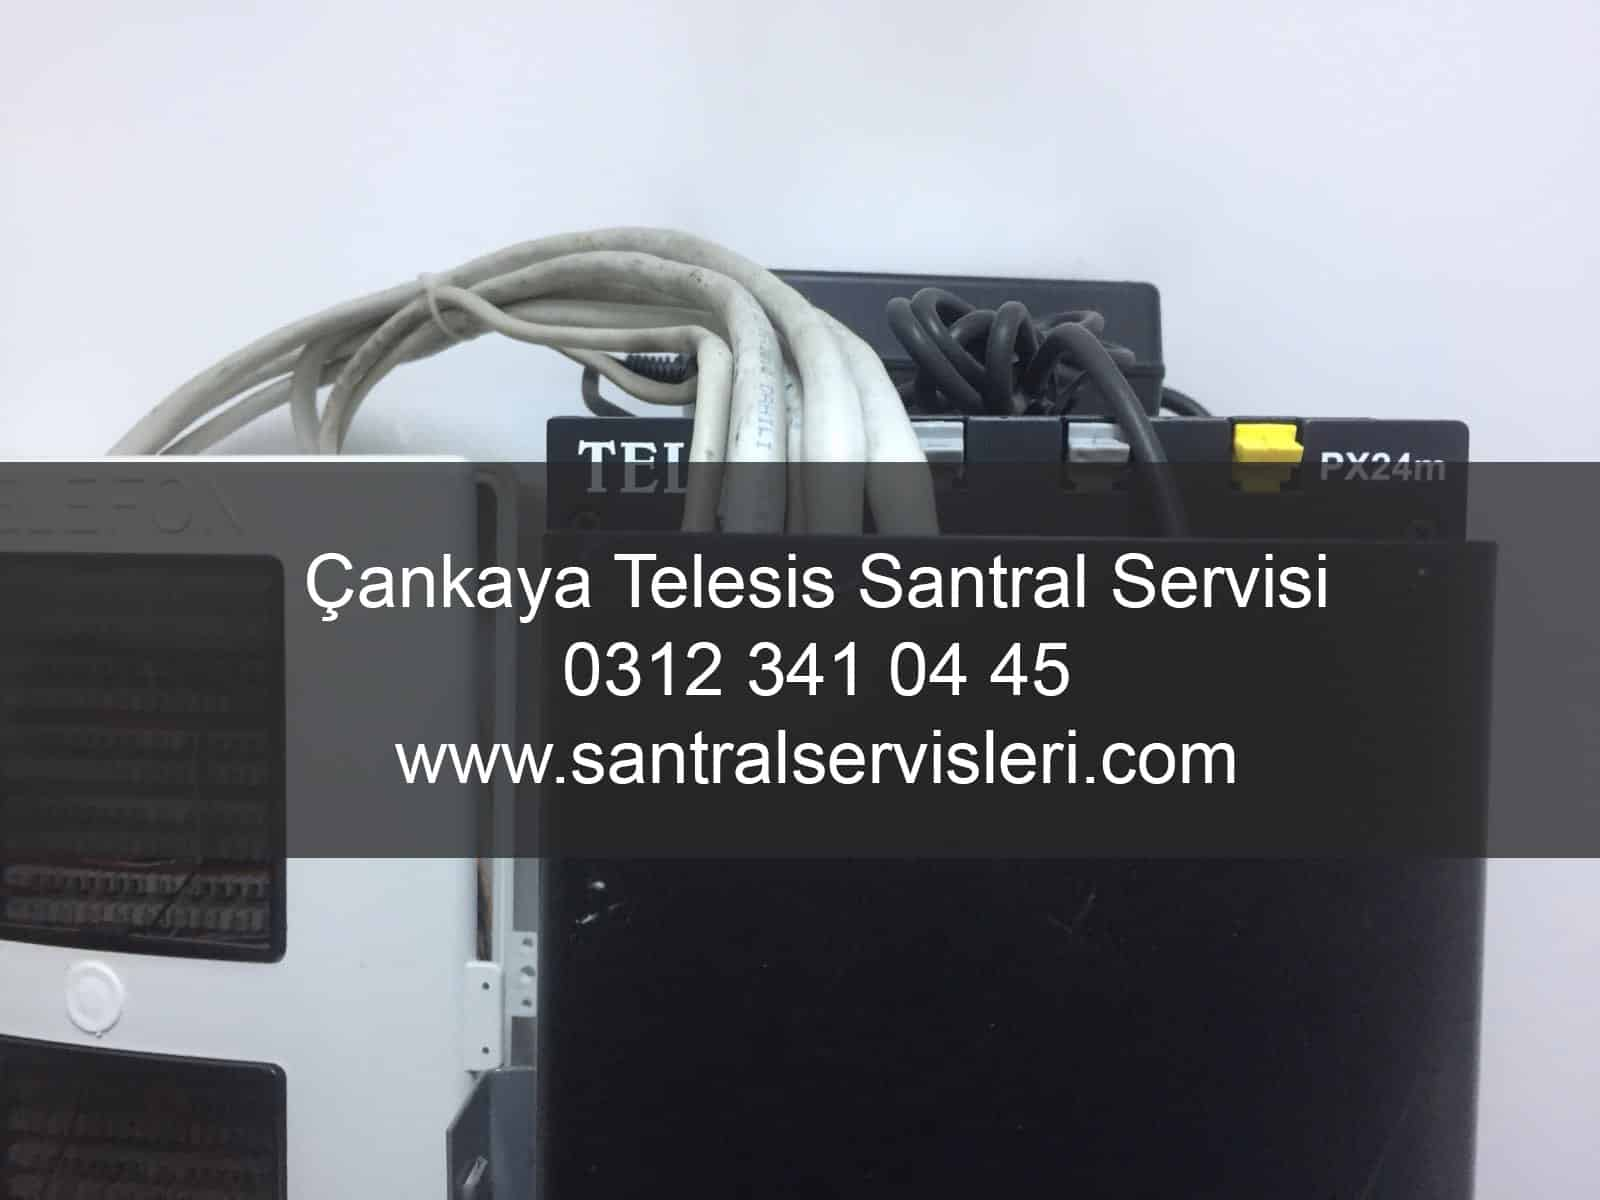 Çankaya Telesis Santral Servisi